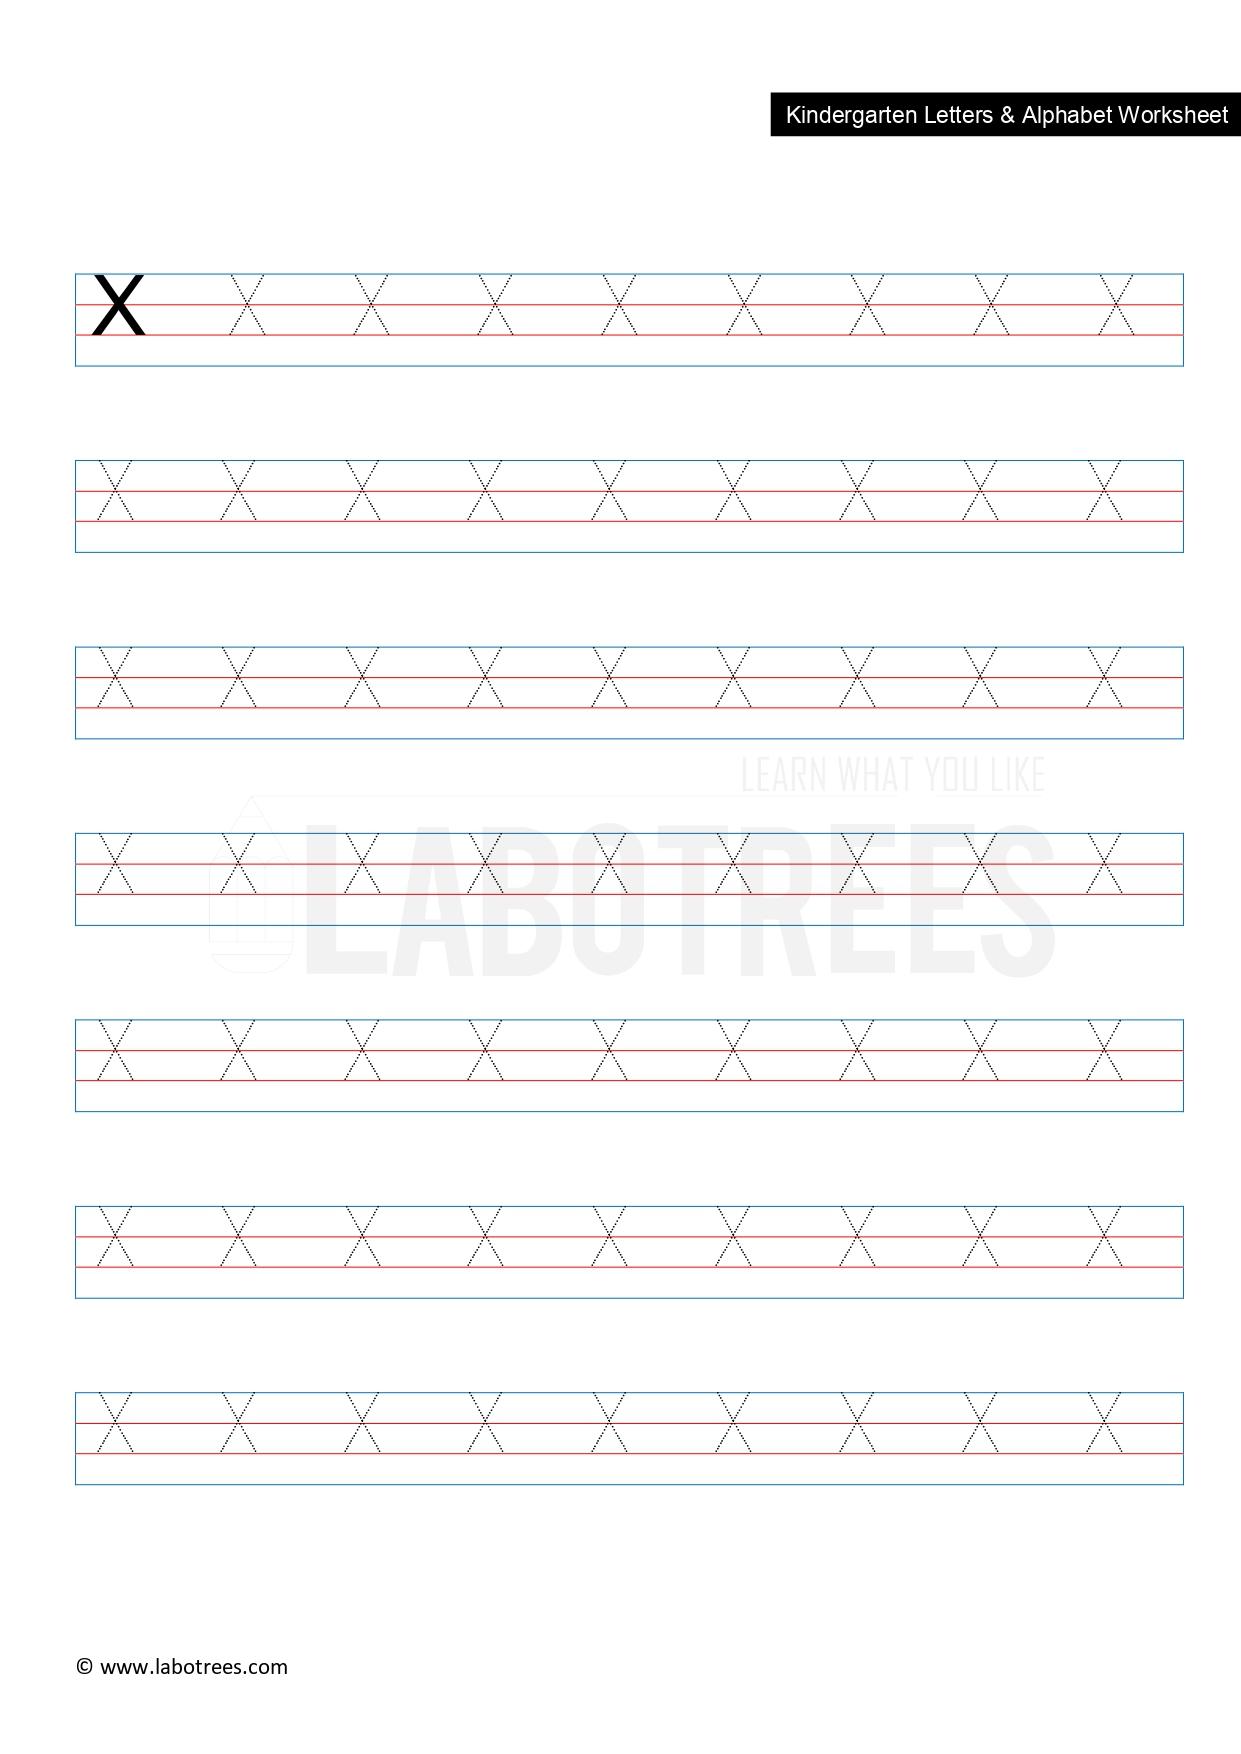 Worksheet Of Letter X Uppercase Free Download